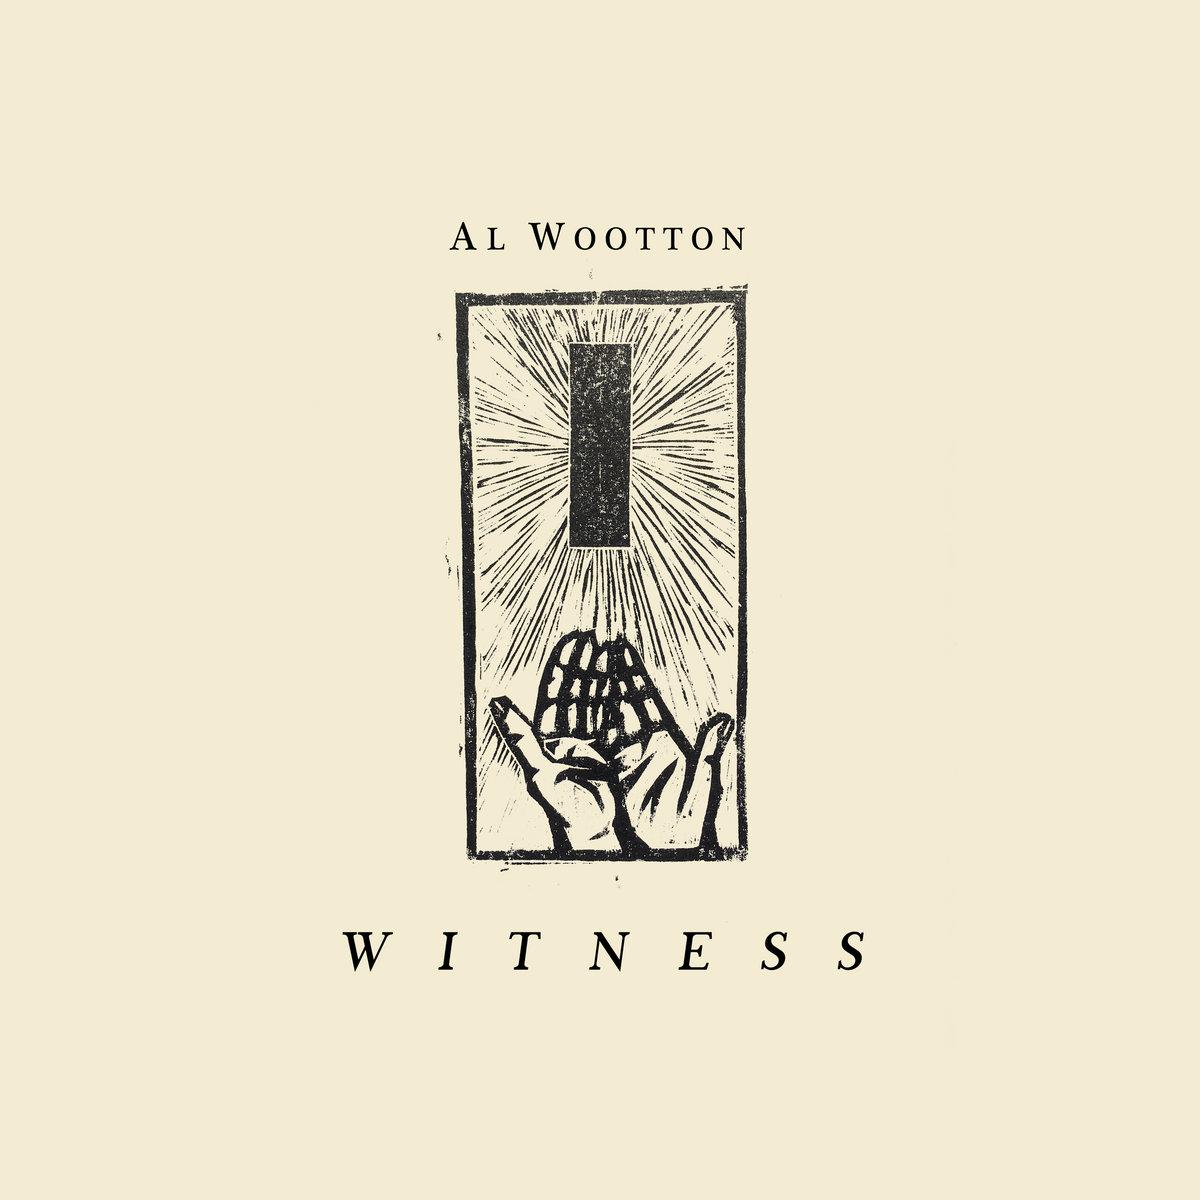 Witness album - Al Wootton